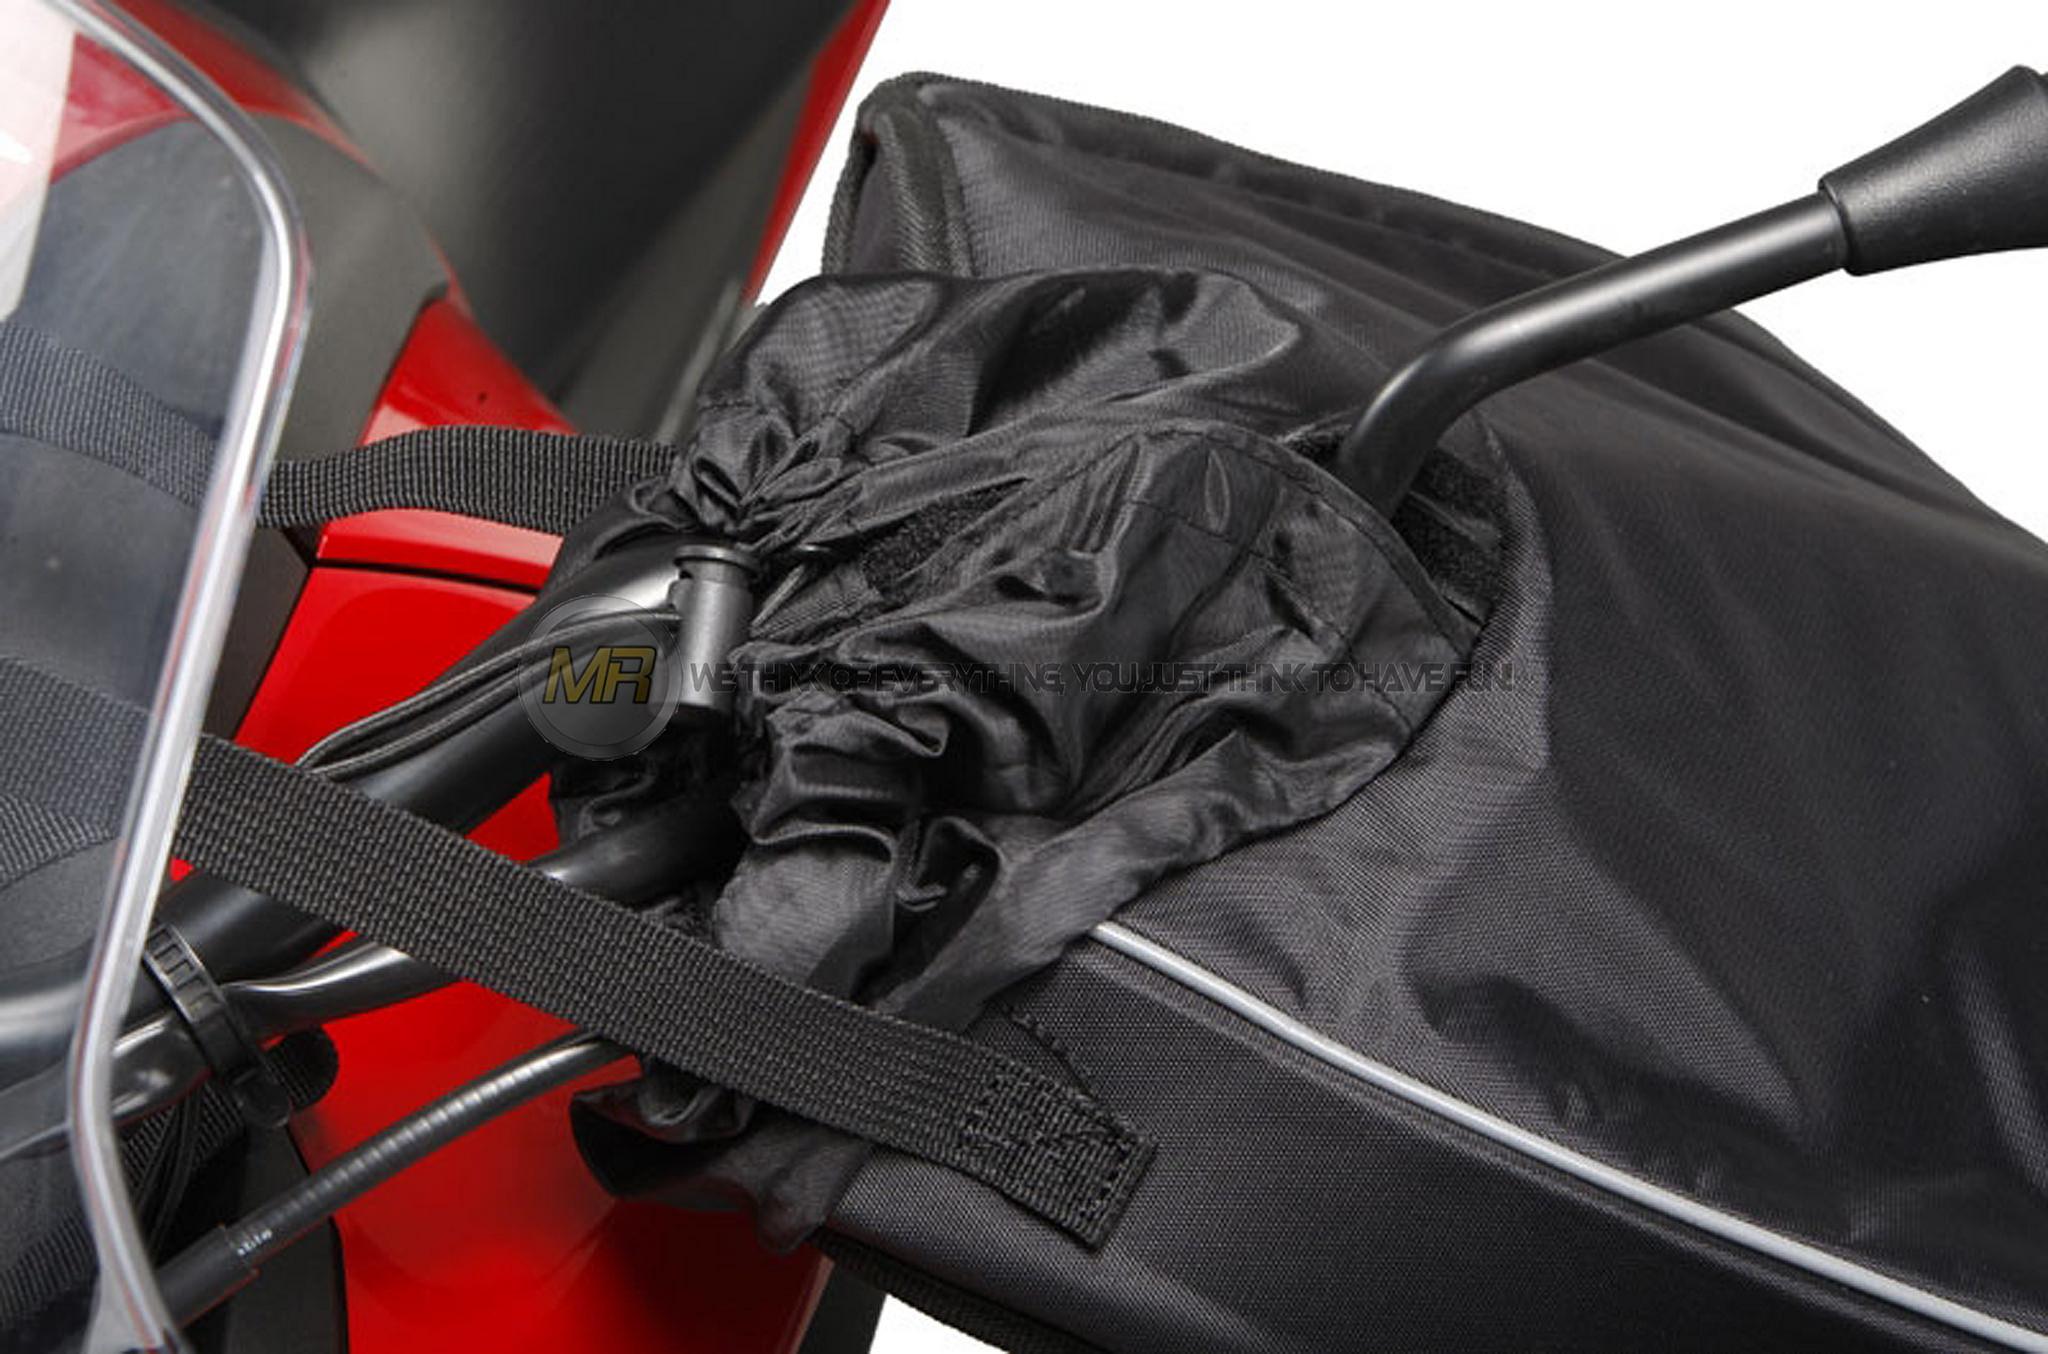 f r bmw hp4 1000 2013 handschutz handw rmer handschuhe. Black Bedroom Furniture Sets. Home Design Ideas